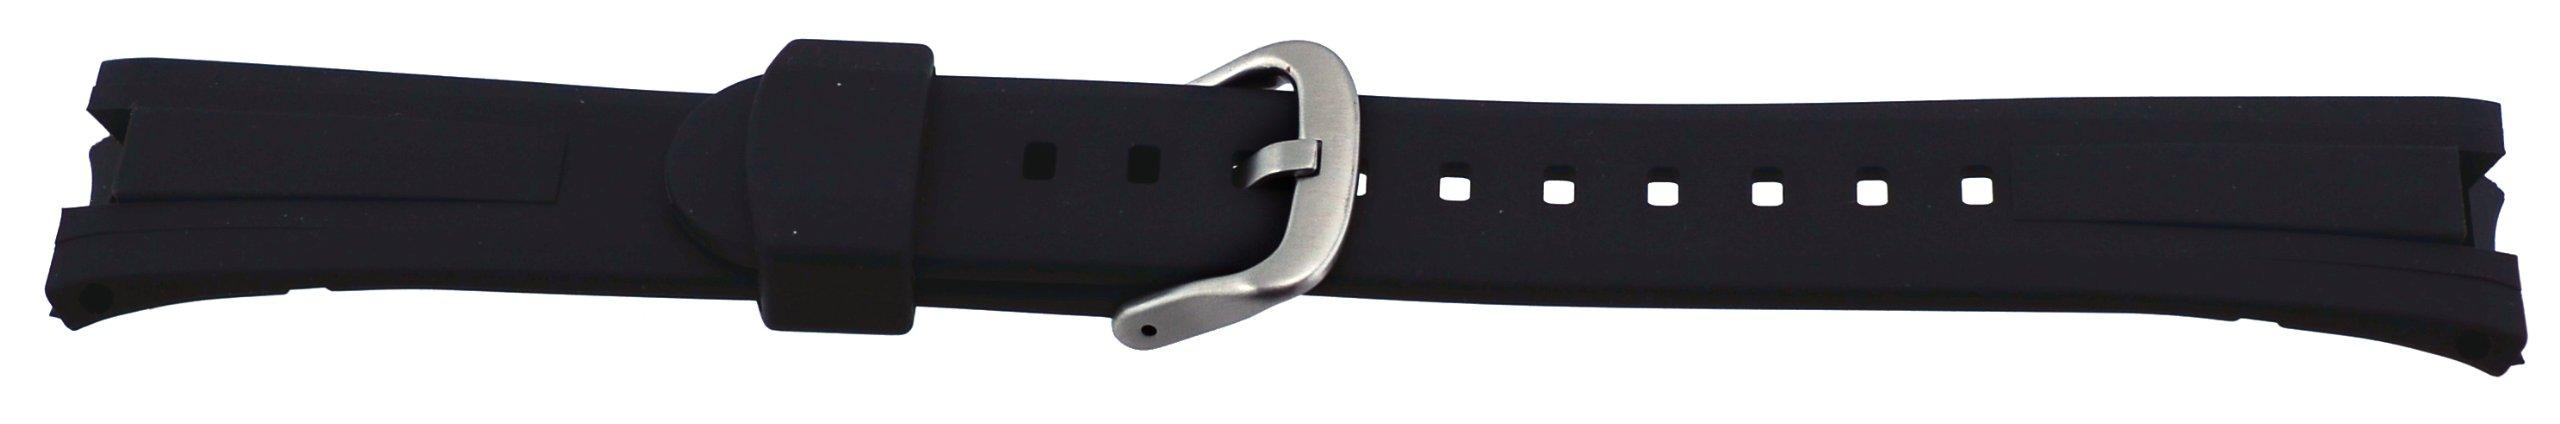 Casio #10447496 Editifice Genuine Factory Replacement Band - EF305-1AV